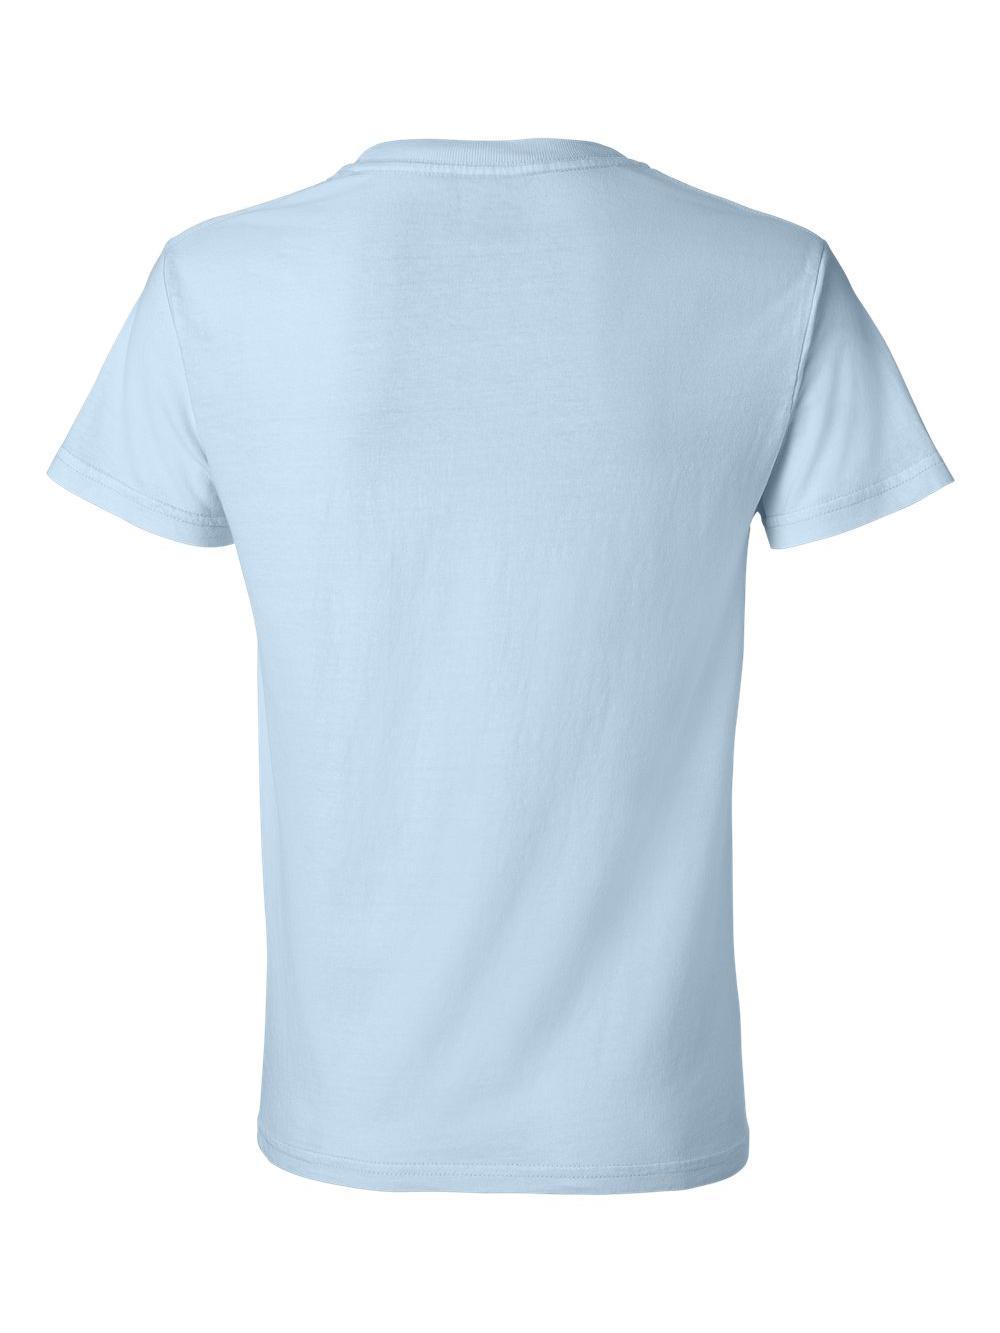 Comfort-Colors-Pigment-Dyed-Ringspun-Women-039-s-Short-Sleeve-T-Shirt-3333 thumbnail 12